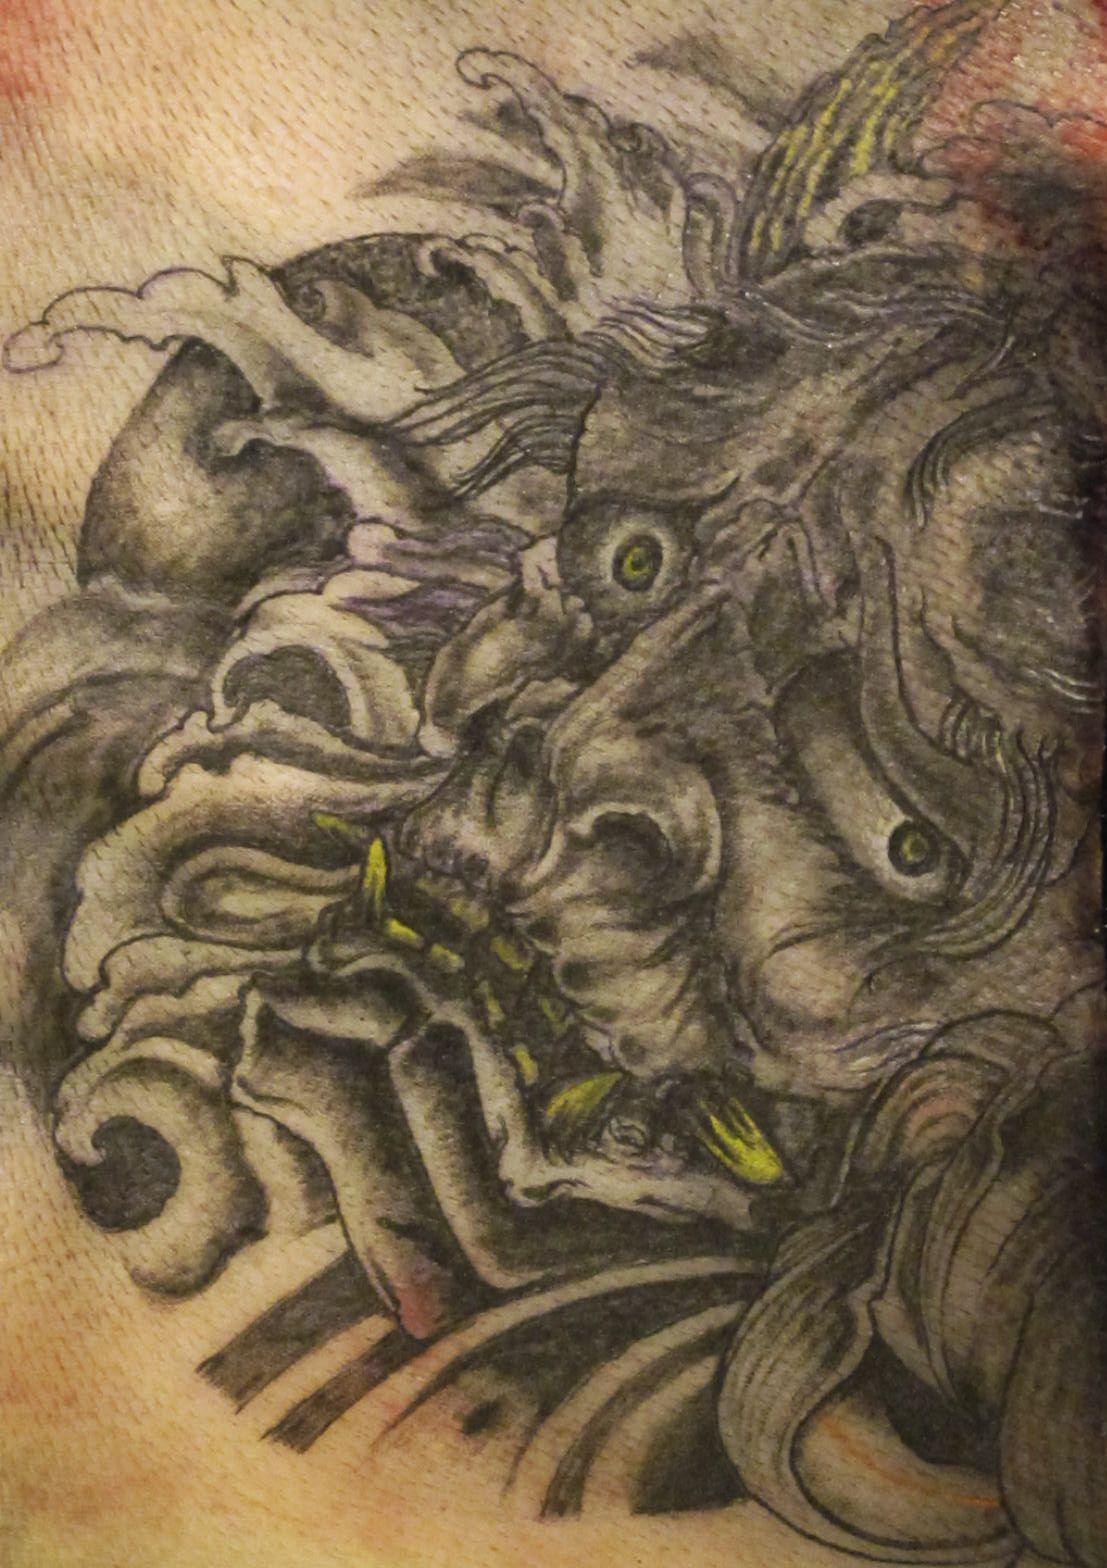 Japanese tattoo mask devil collingwood tattooist for Tattoo practice pig skin